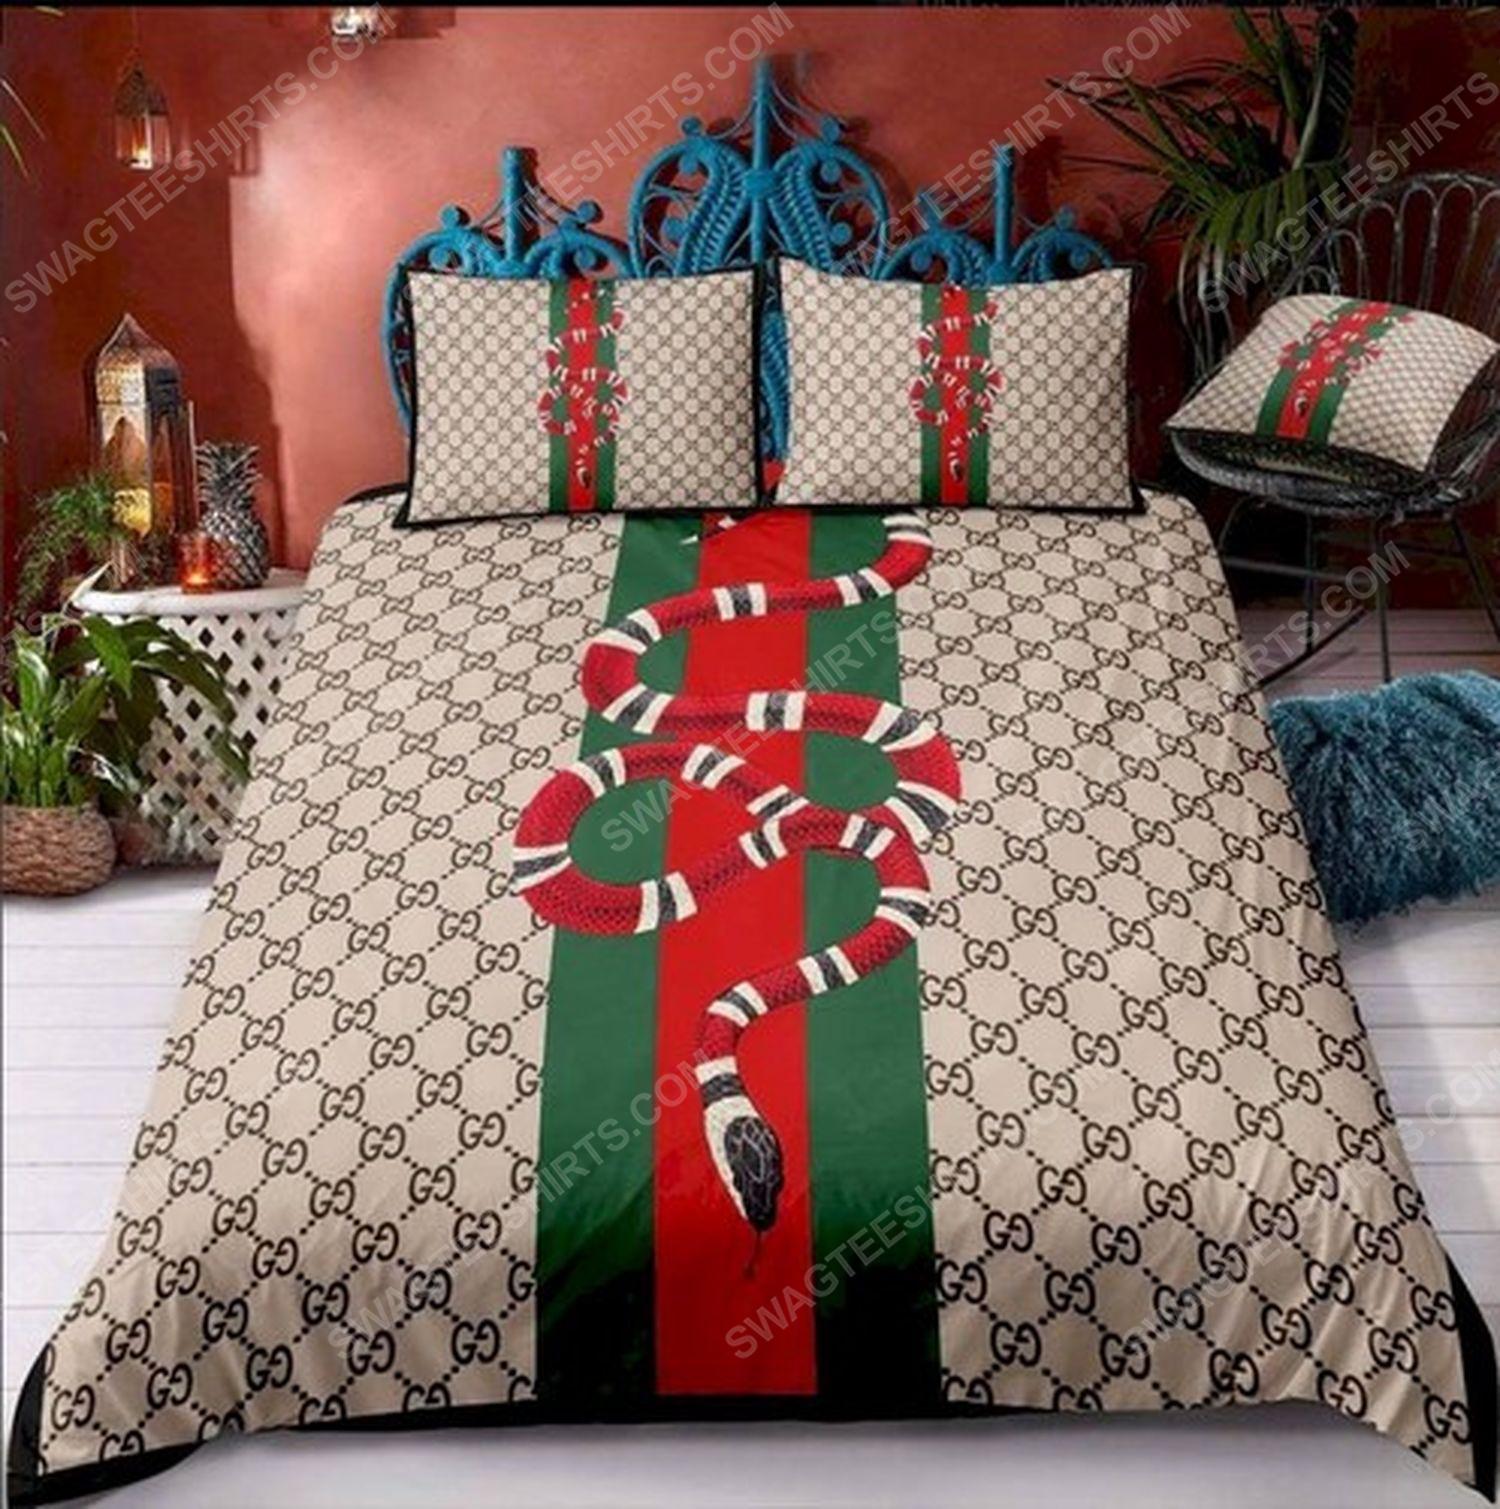 Gucci and snack symbols full print duvet cover bedding set 3